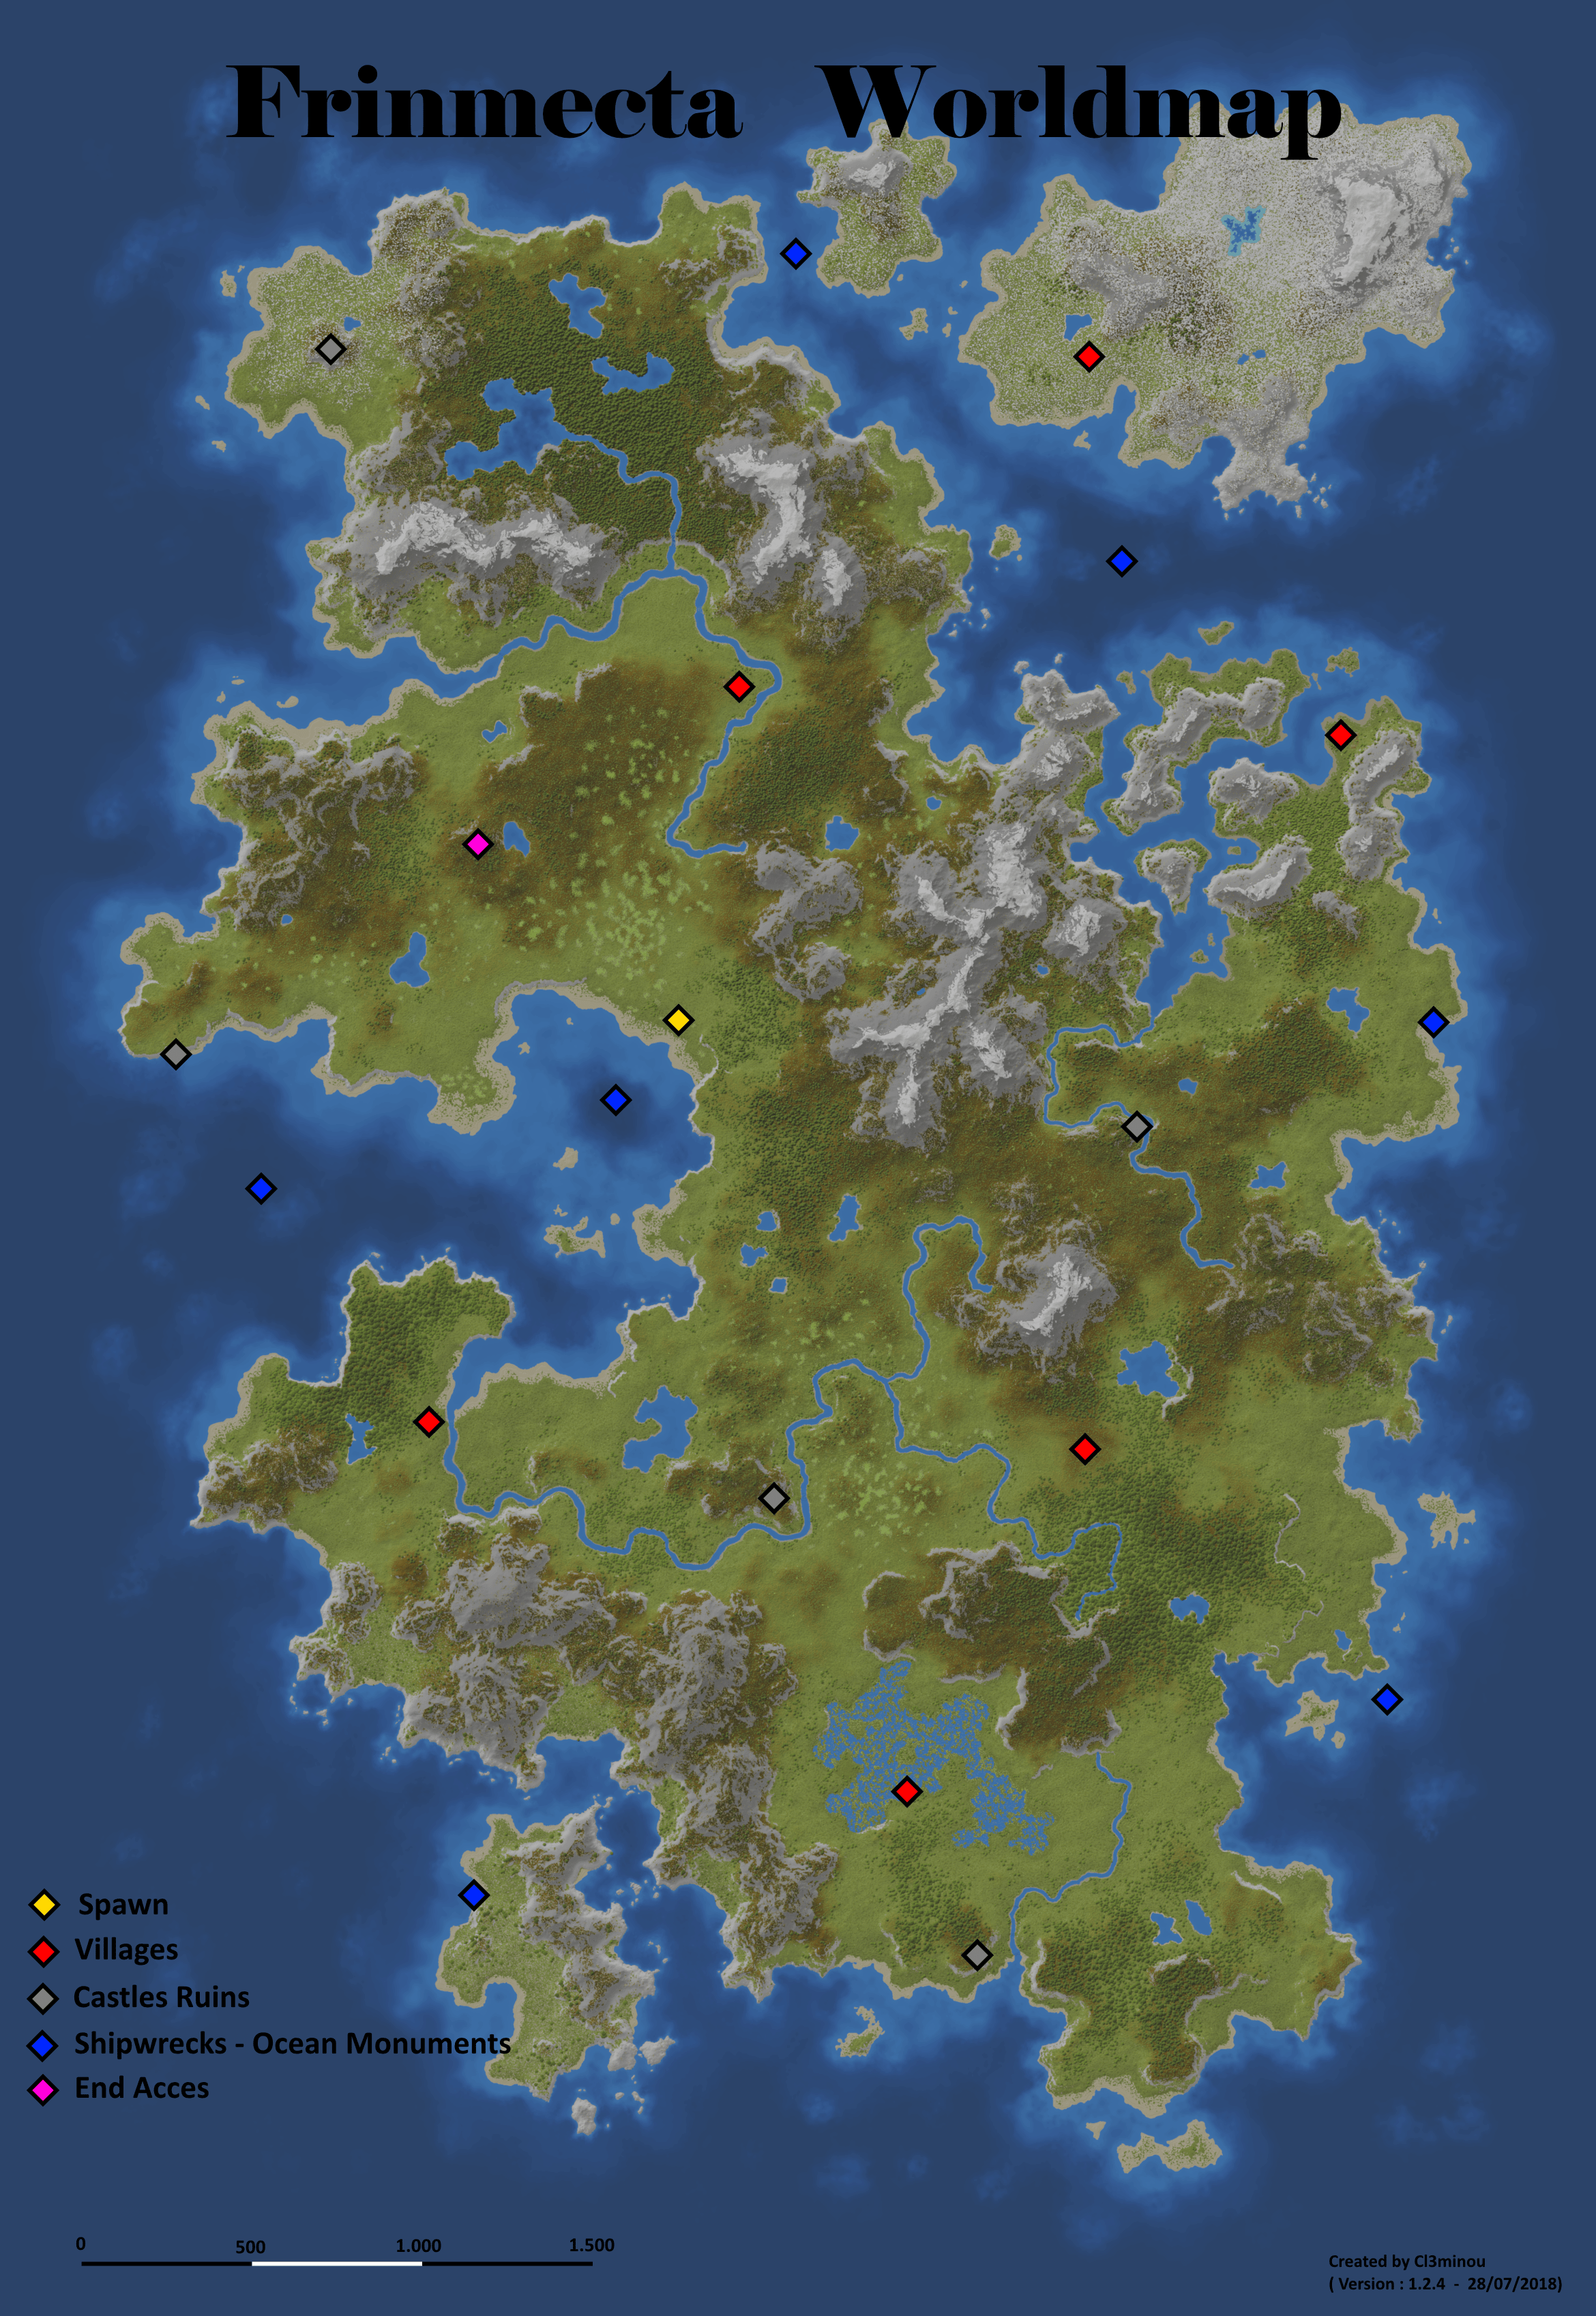 [SPOILERS] Locations - Frinmecta Worldmap (1.2.4)-min.png